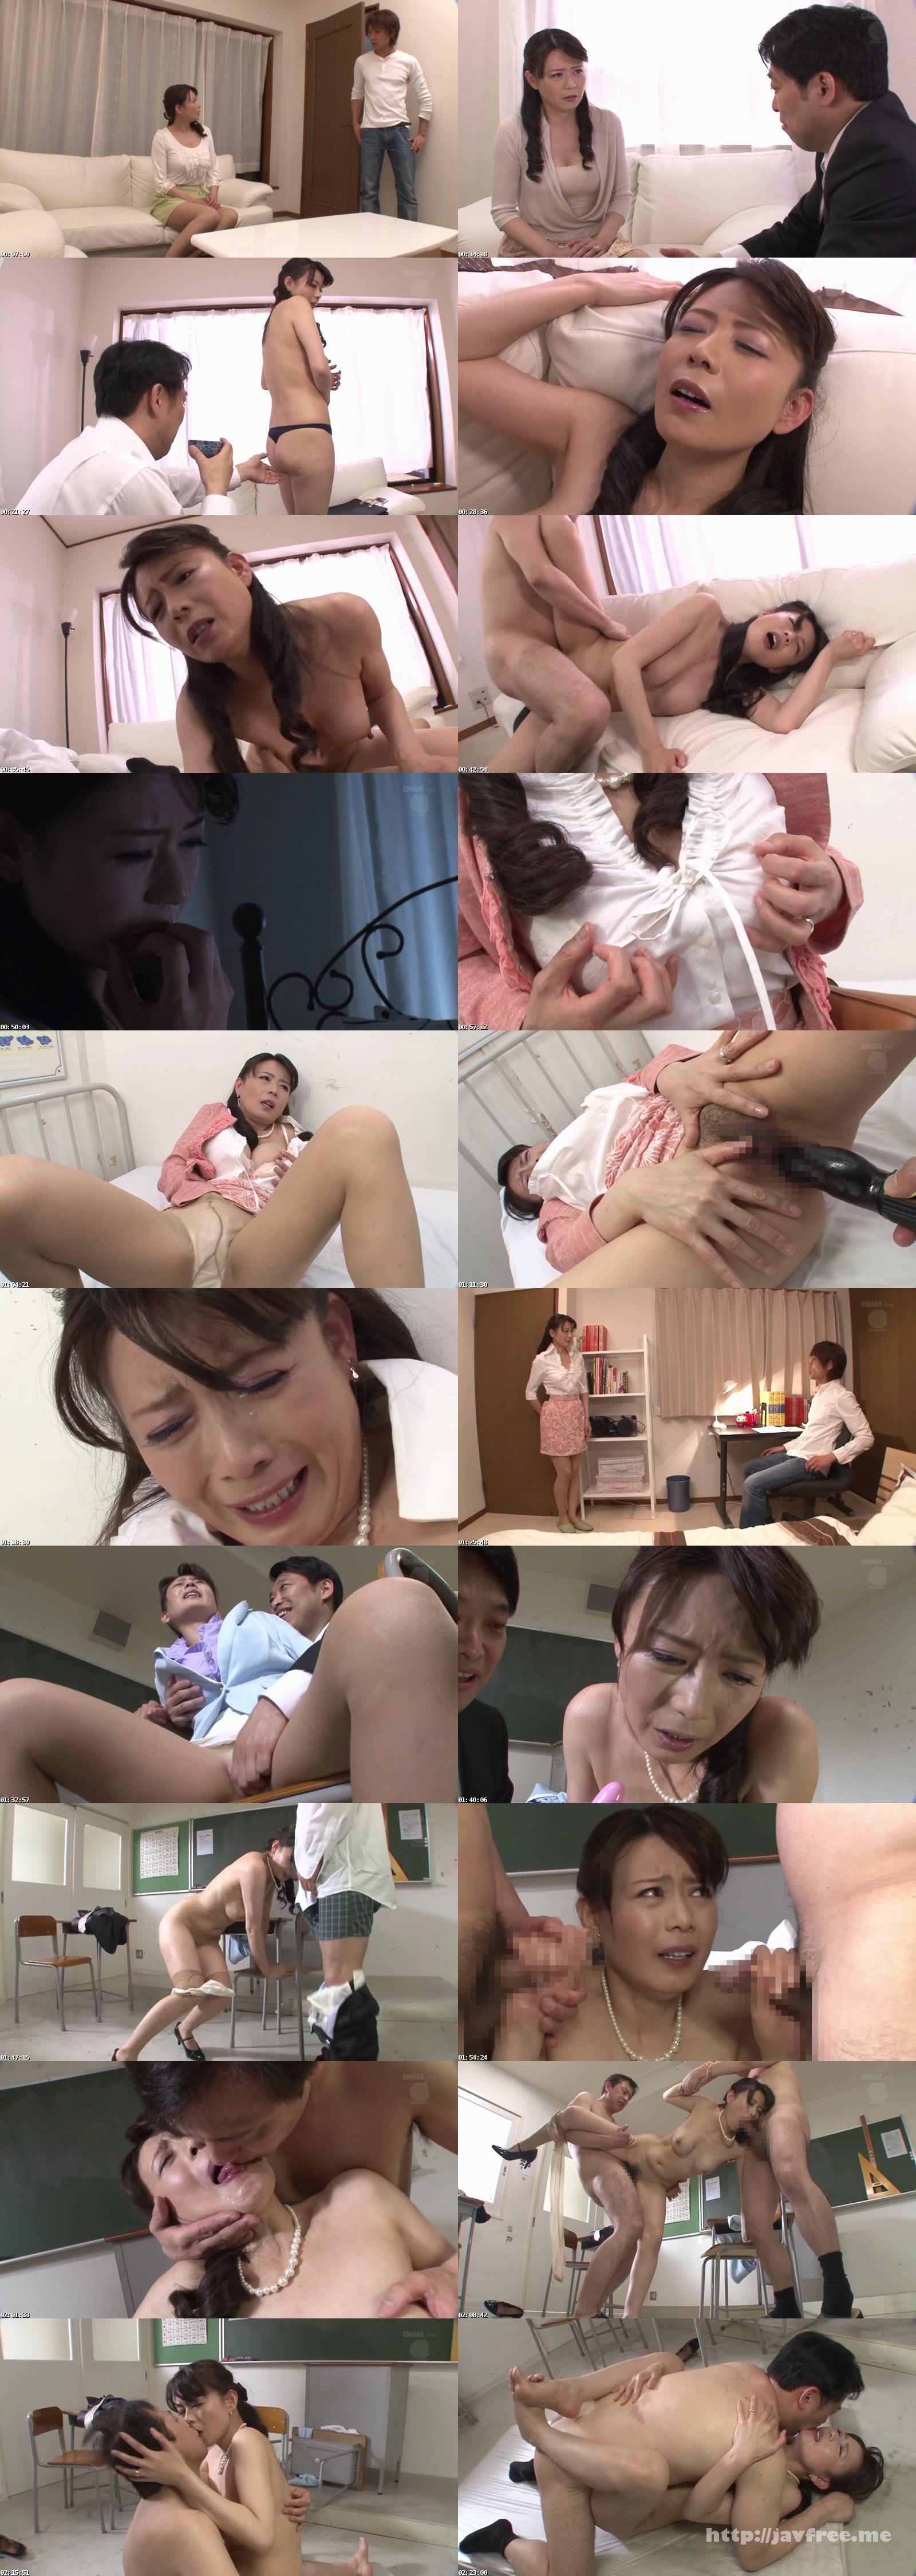 [JUX 420] お受験ママの肉体内申書 三浦恵理子 三浦恵理子 JUX